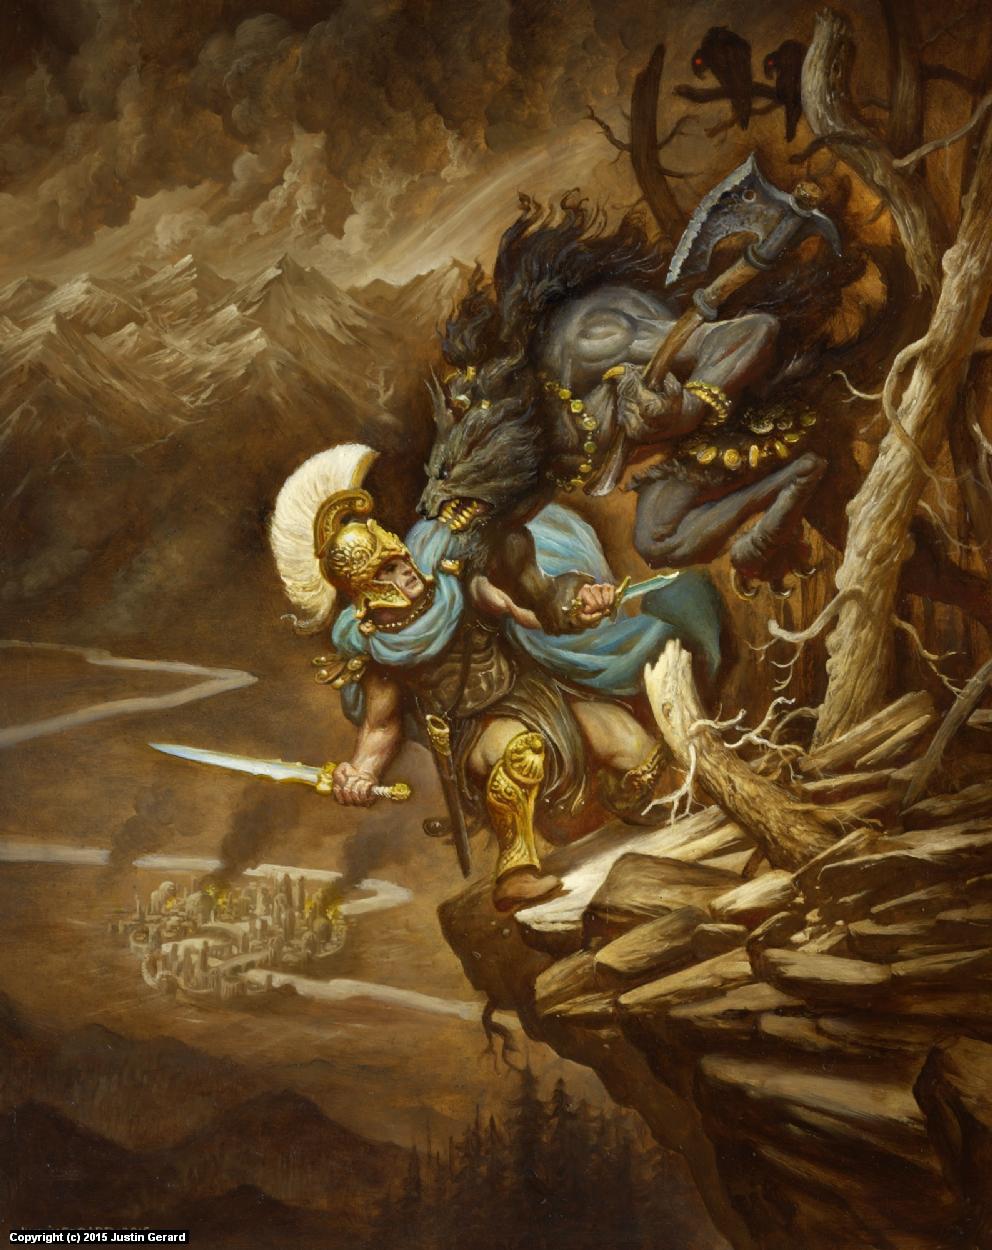 The Silmarillion no. 34 Artwork by Justin Gerard